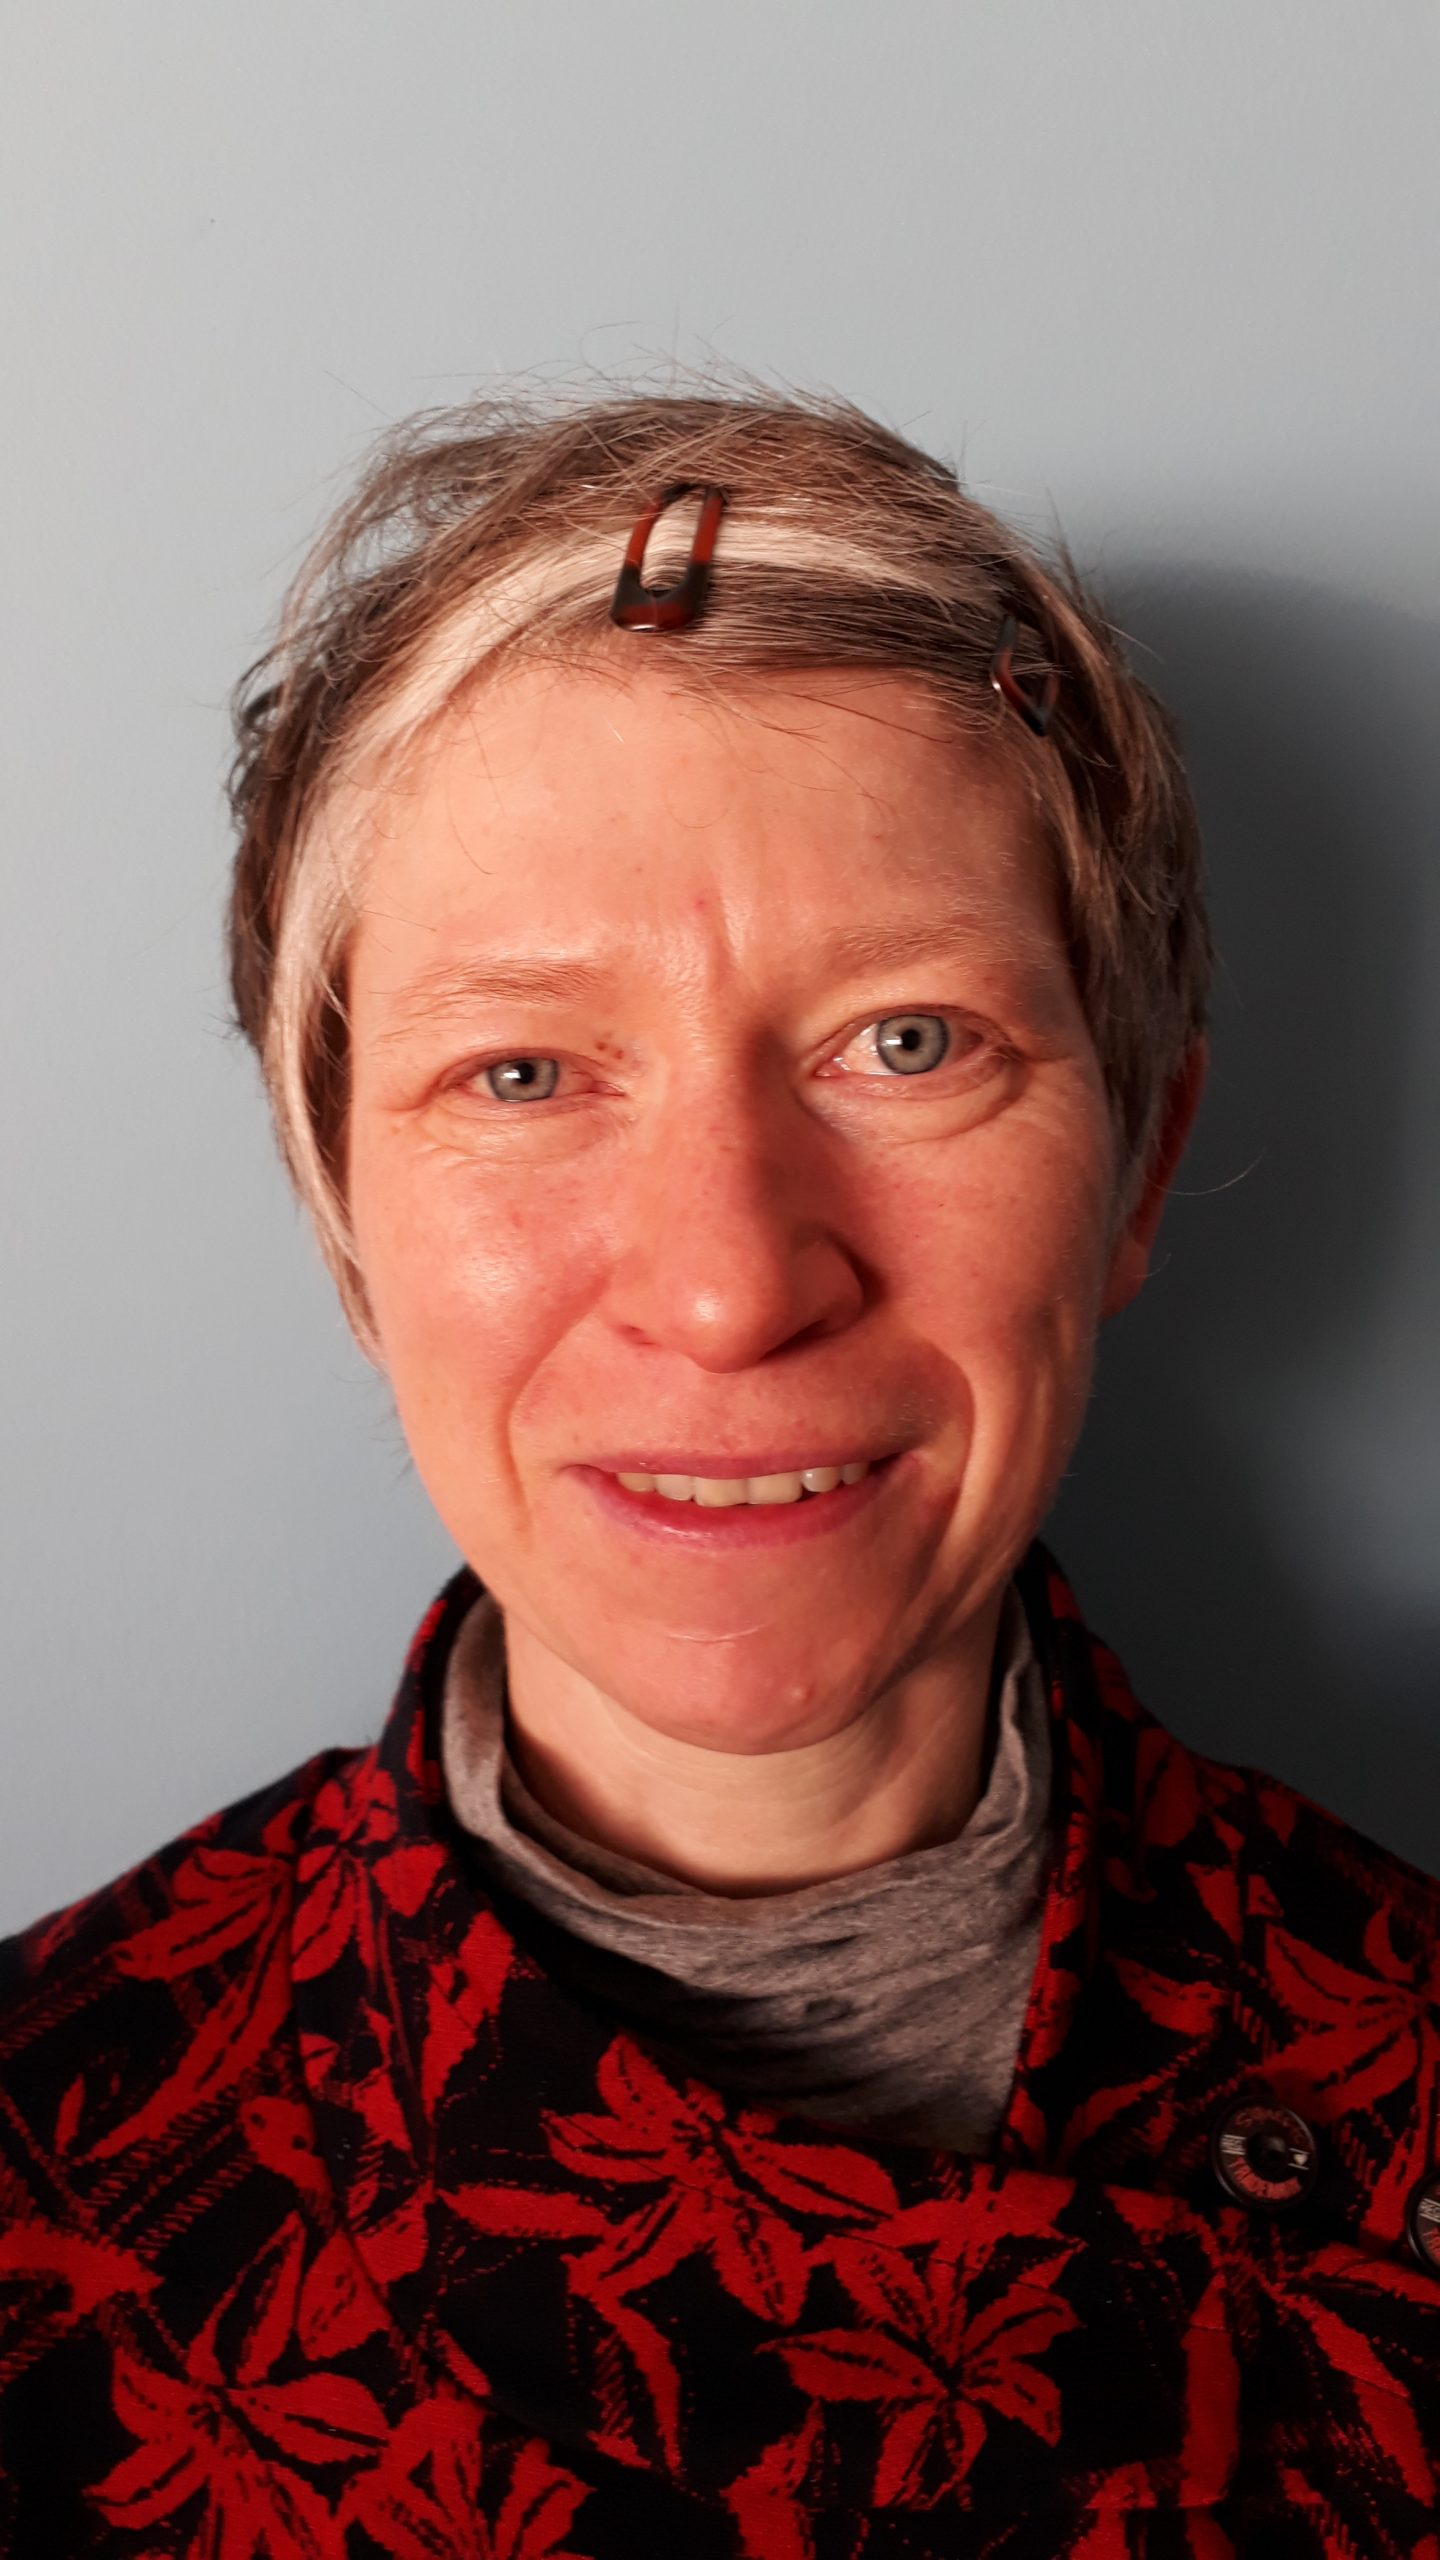 Anja Petrie